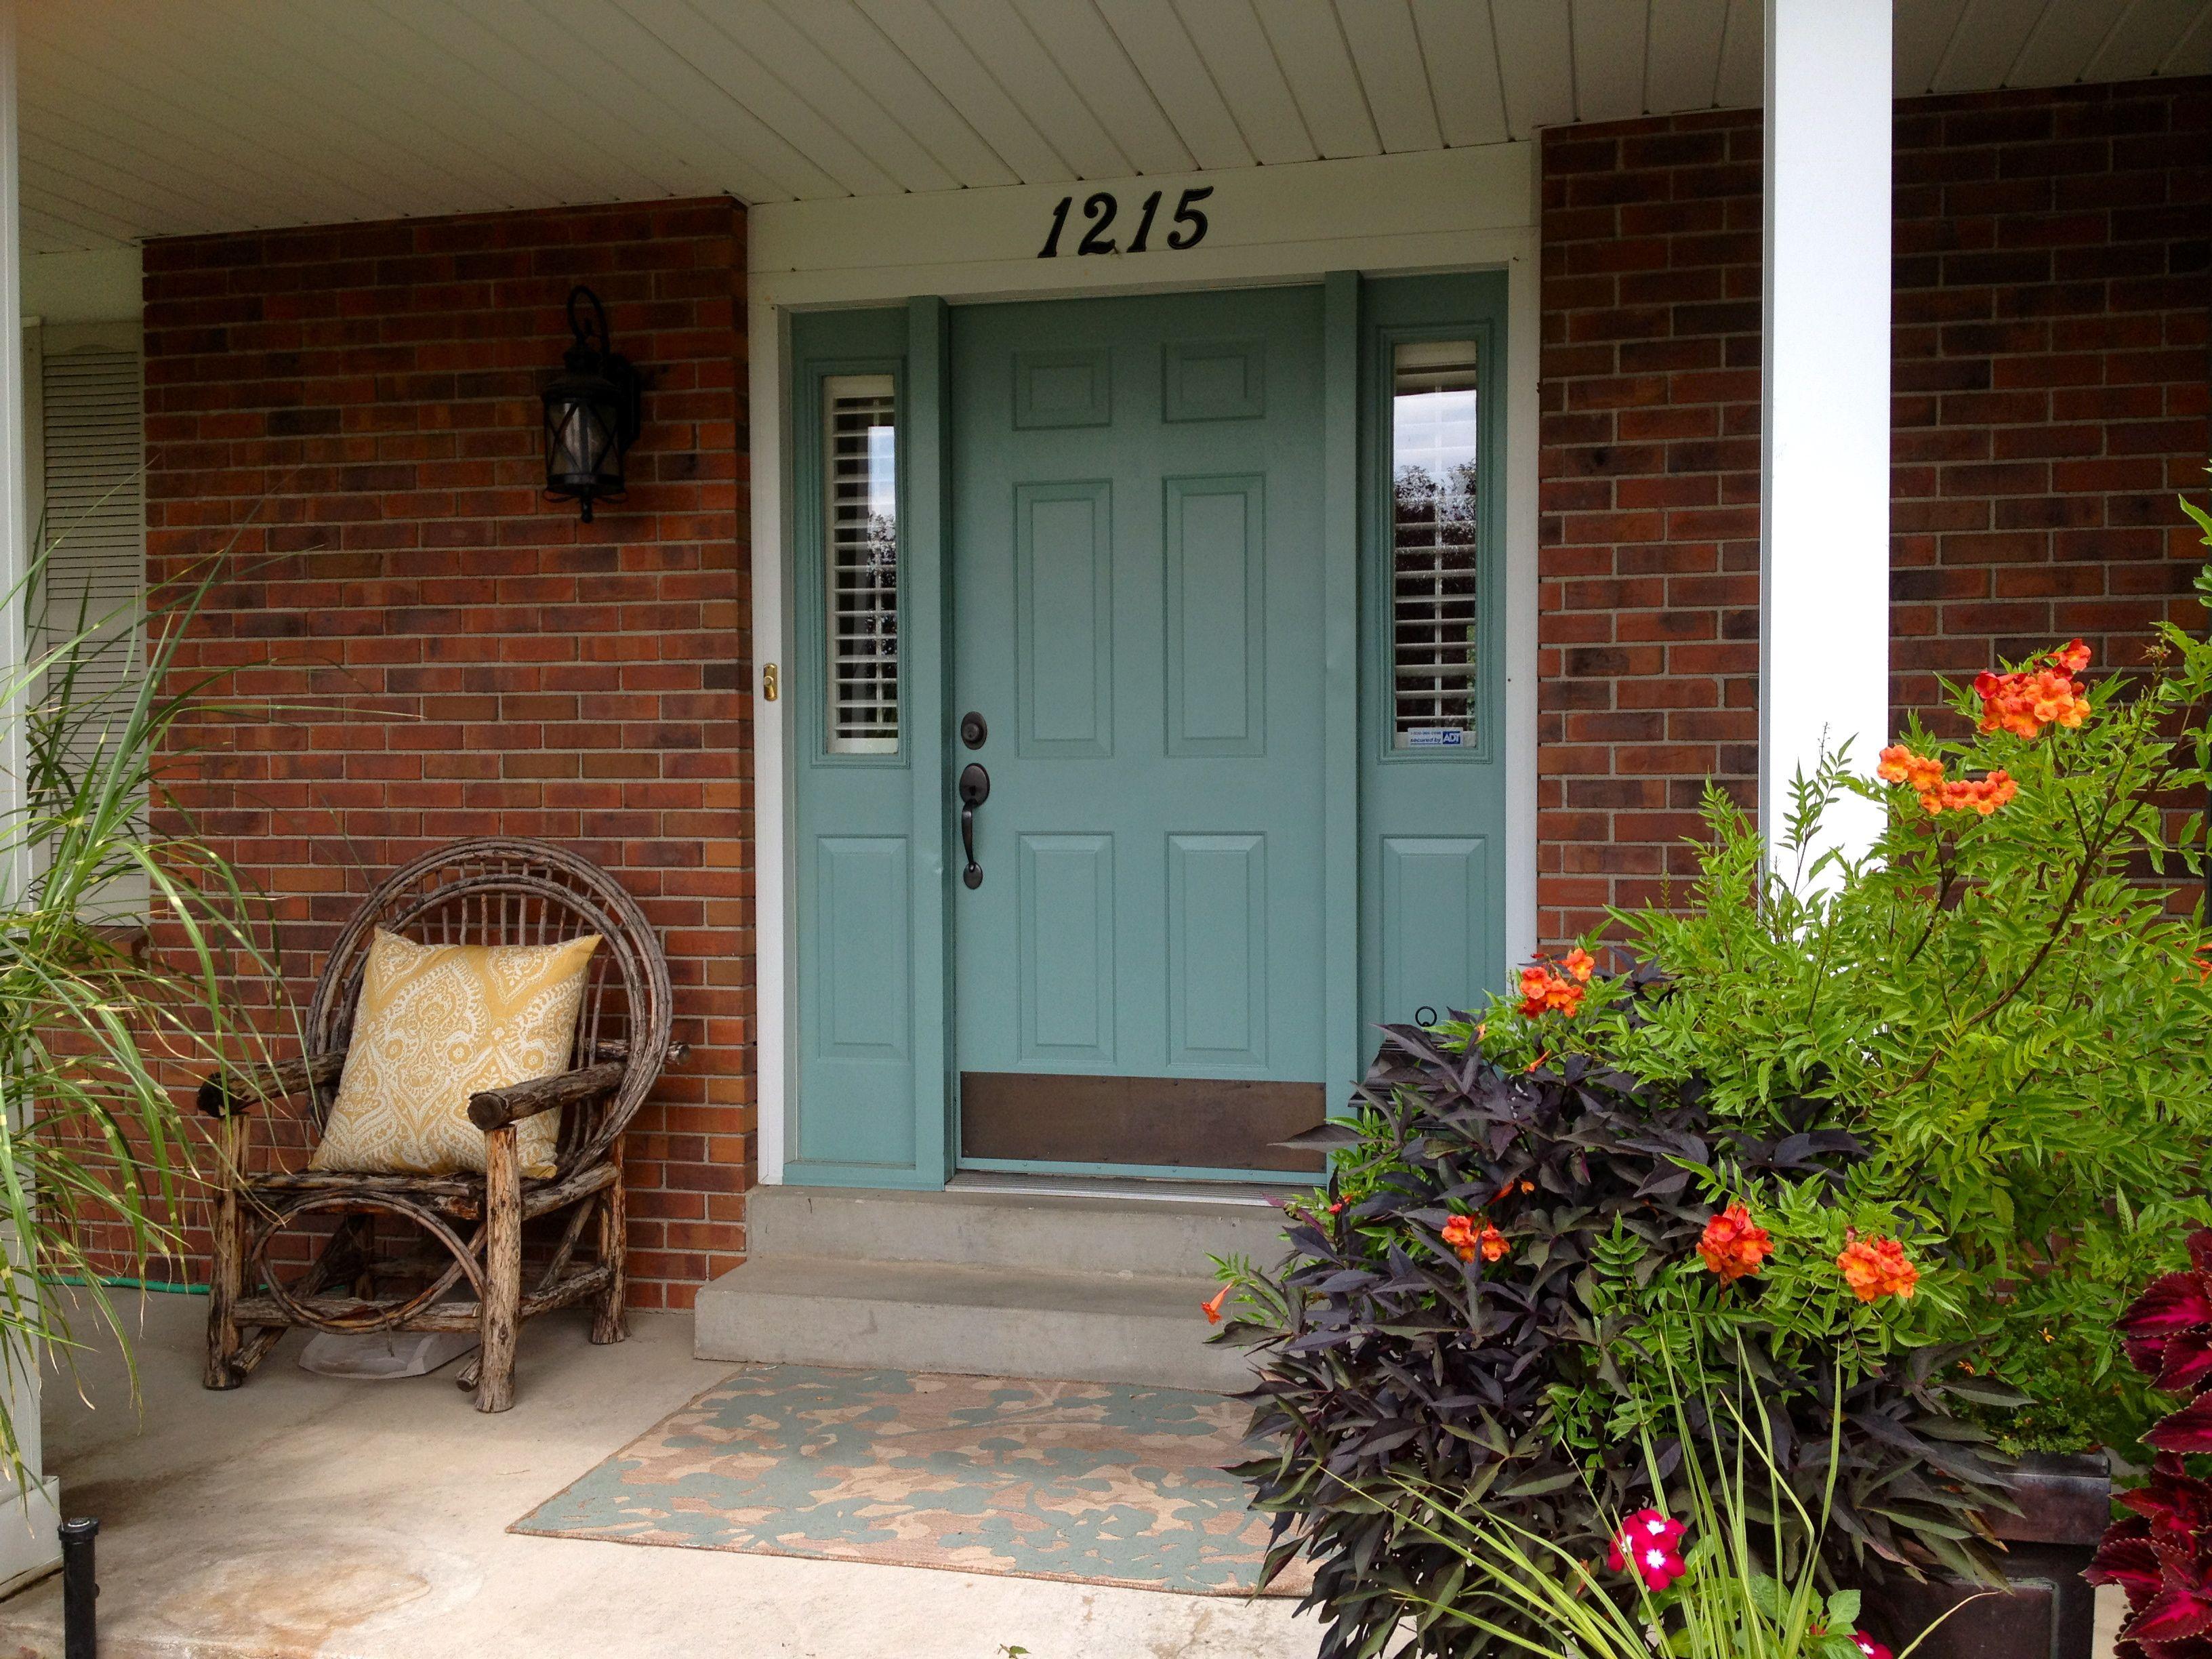 My new painted door mill springs blue by benjiman moore - Front door colors for red brick house ...